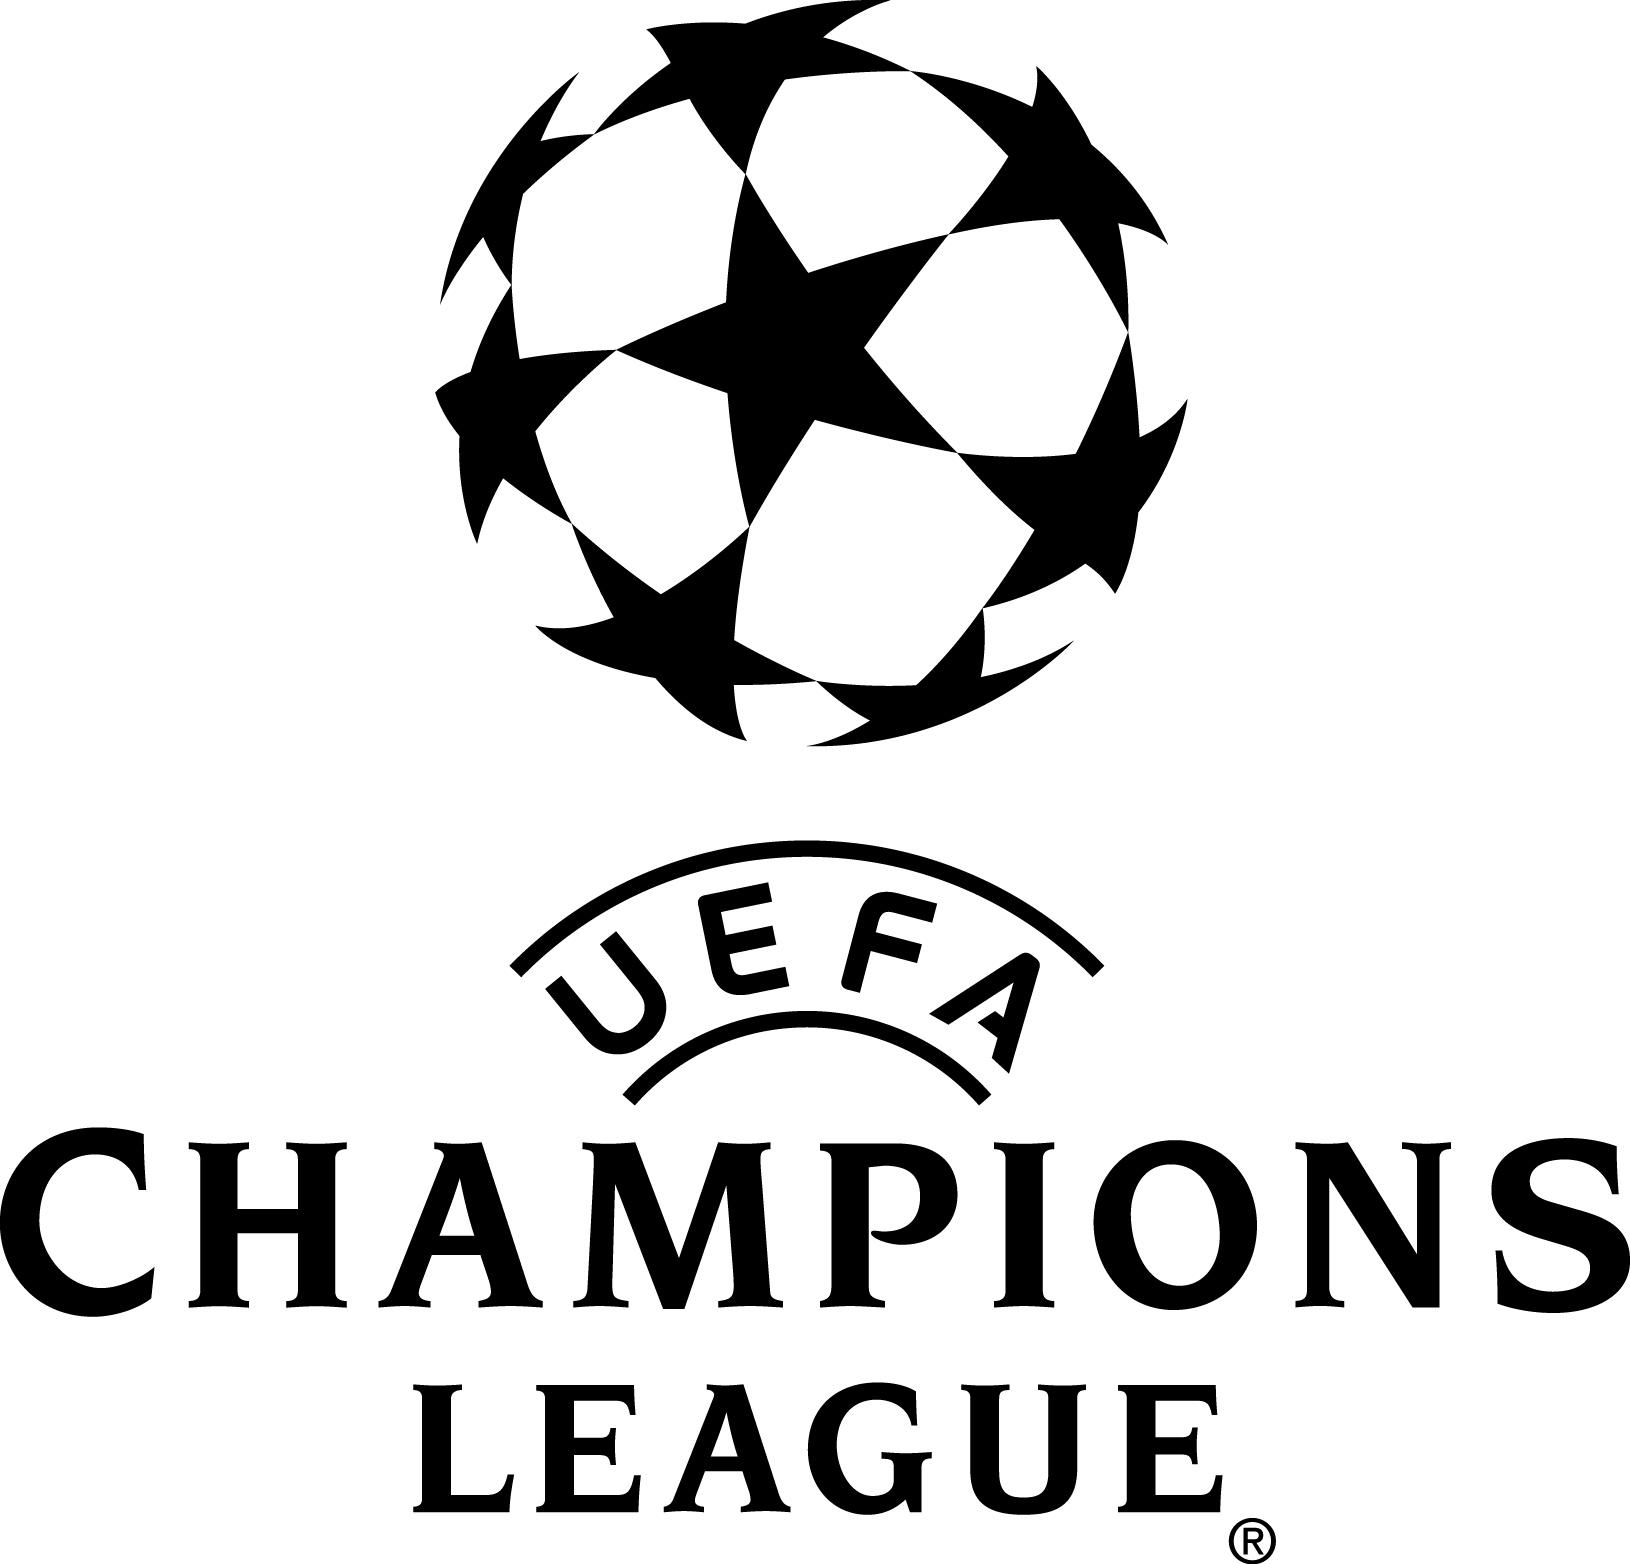 Uefa Champions League Logo (Classic) - Uefa Euro 2017 Vector, Transparent background PNG HD thumbnail